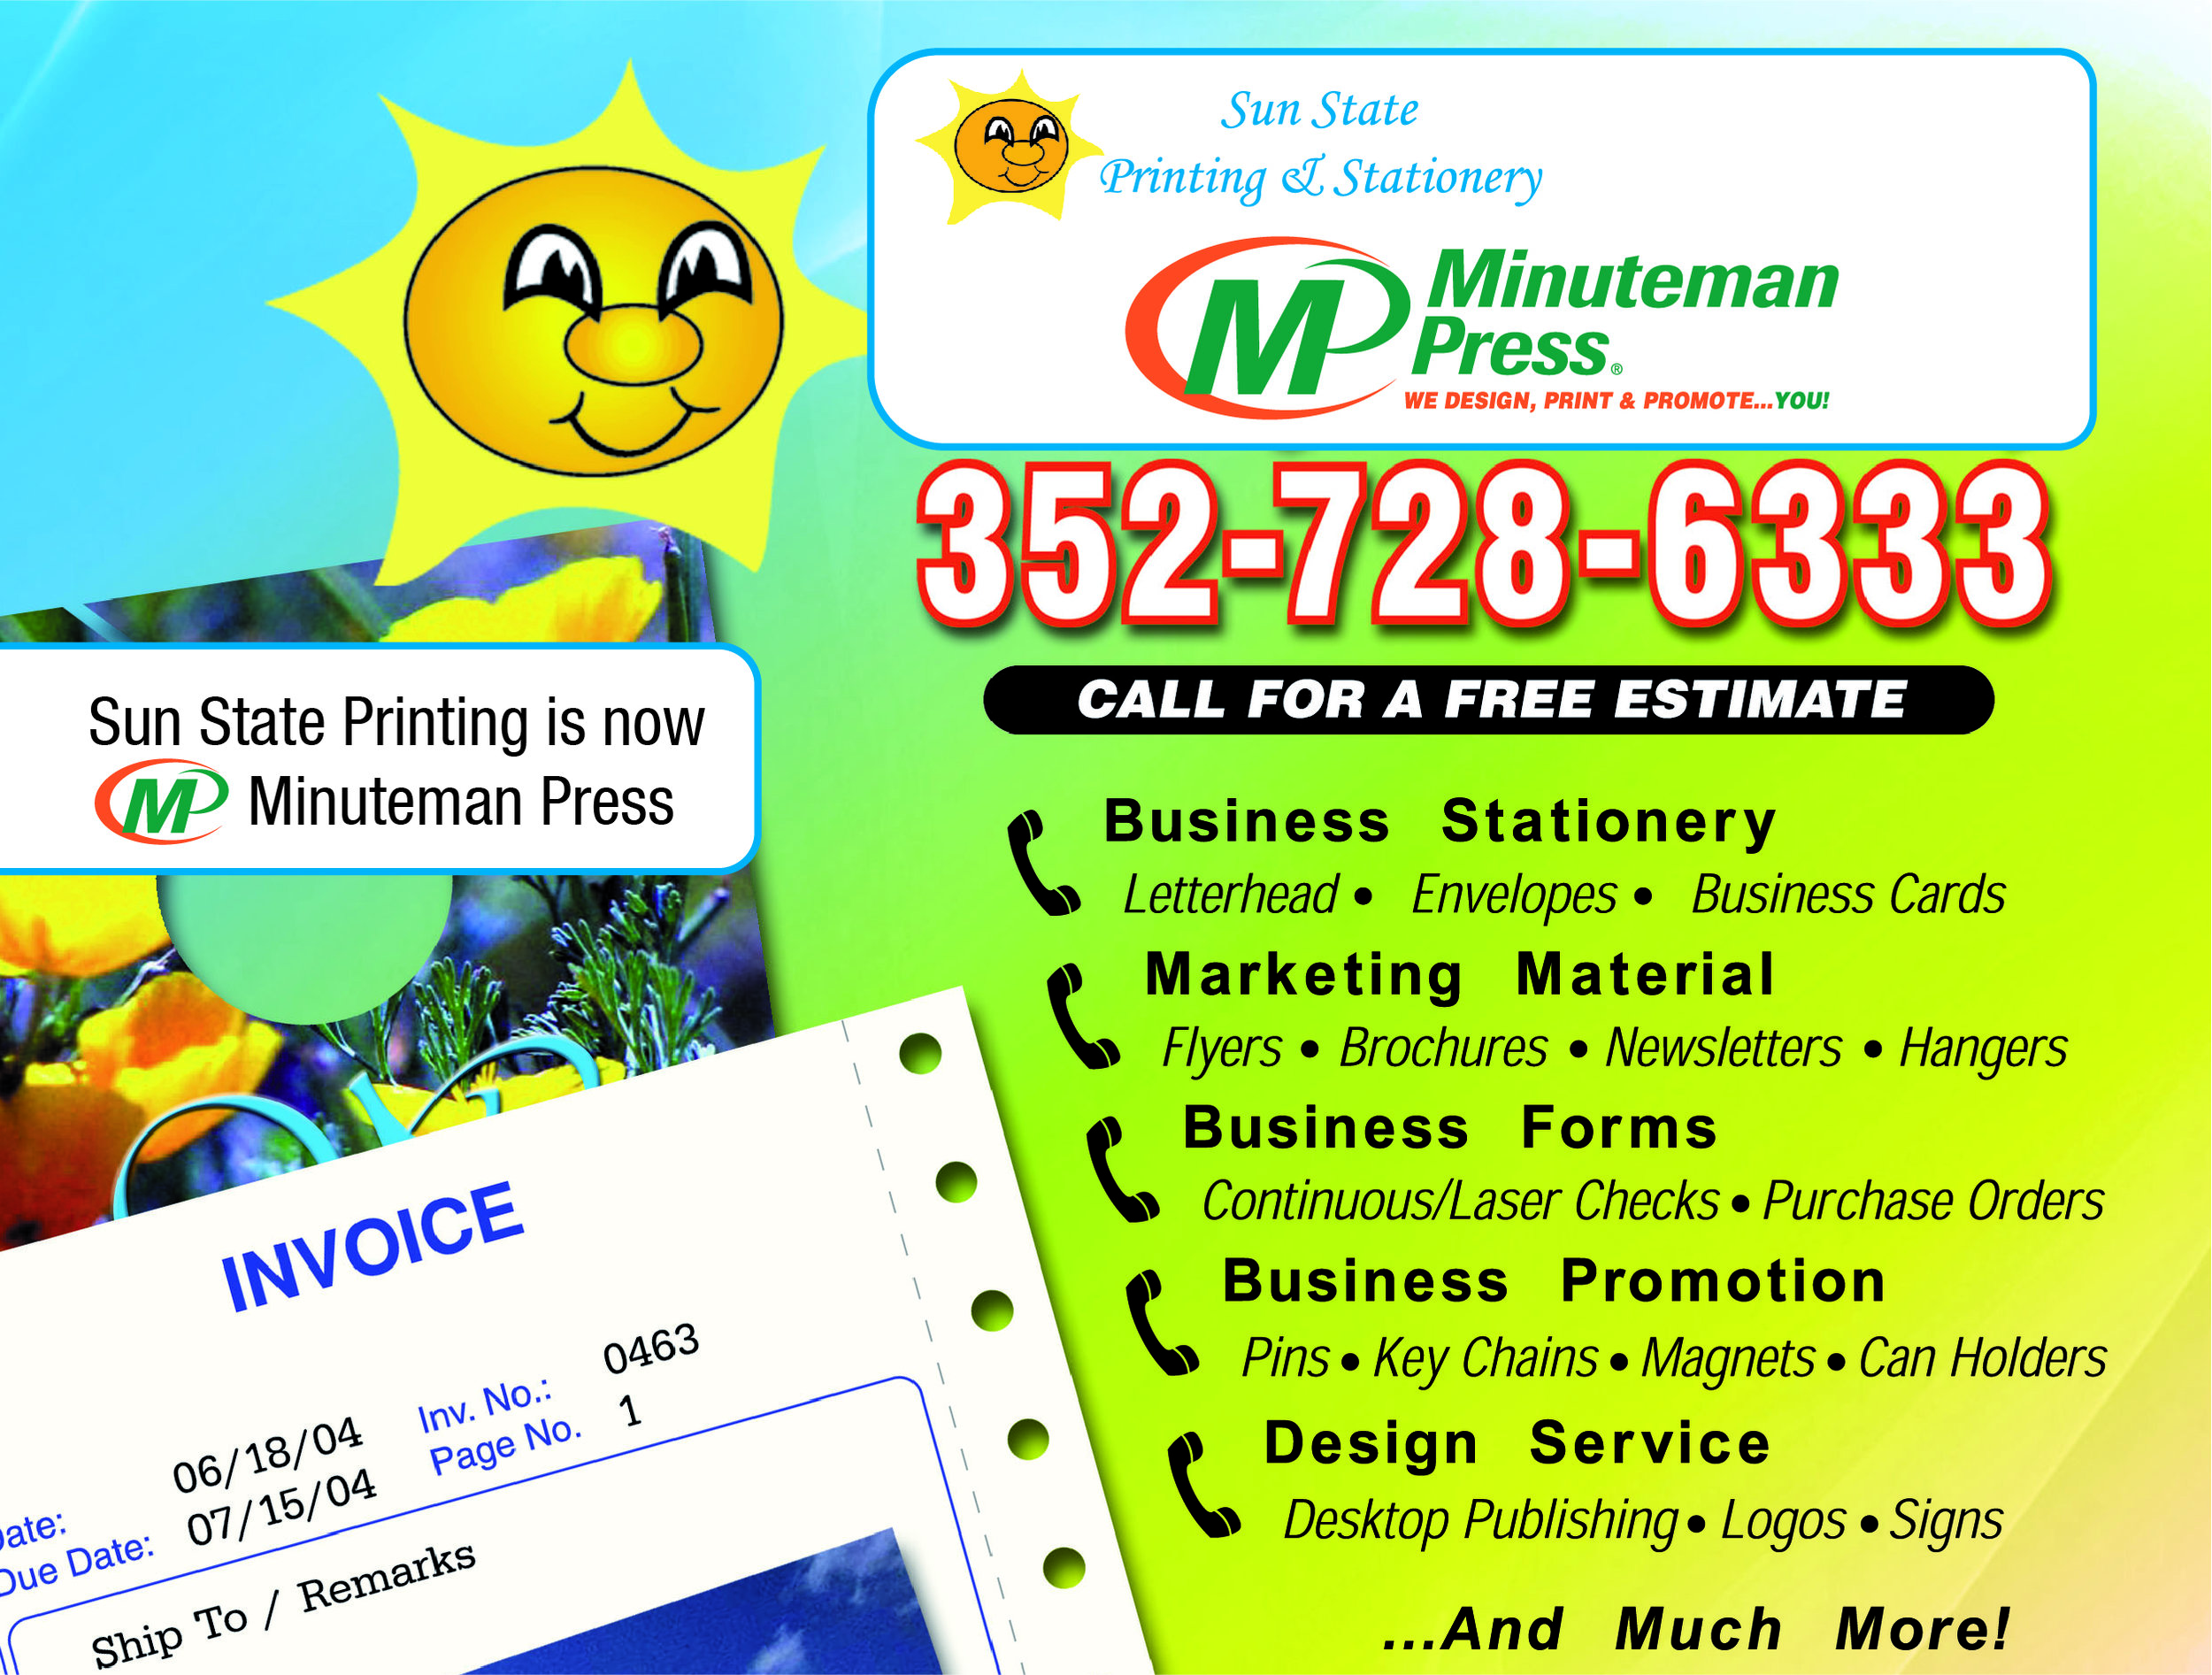 cobrand sunstate and mmp website backdrop-01.jpg